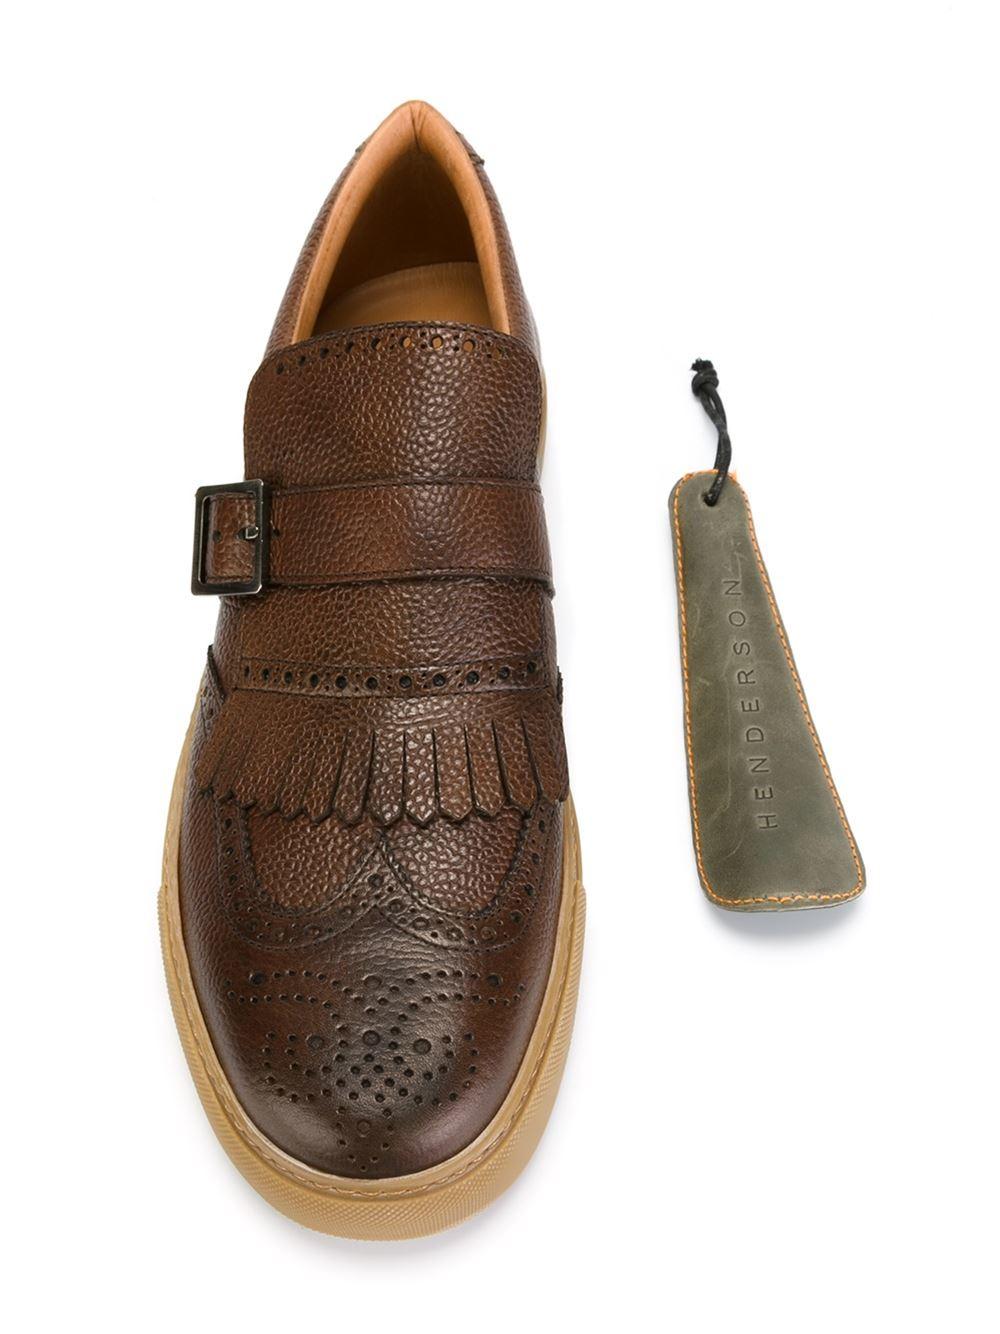 più economico 7ef4f 93bb5 Henderson Brogue-style Sneakers in Brown for Men - Lyst